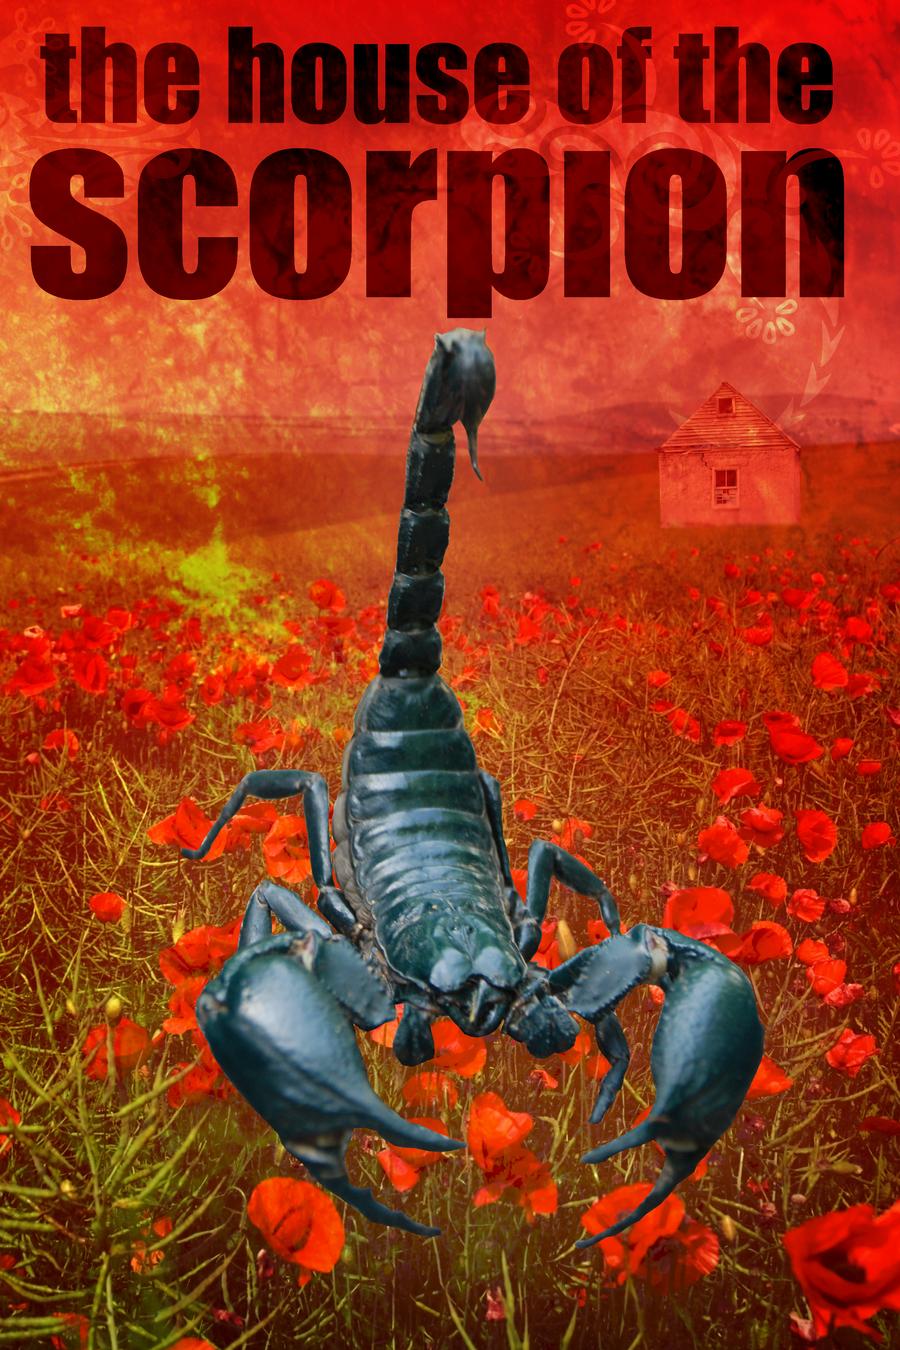 houseofthescorpion | Explore houseofthescorpion on DeviantArt